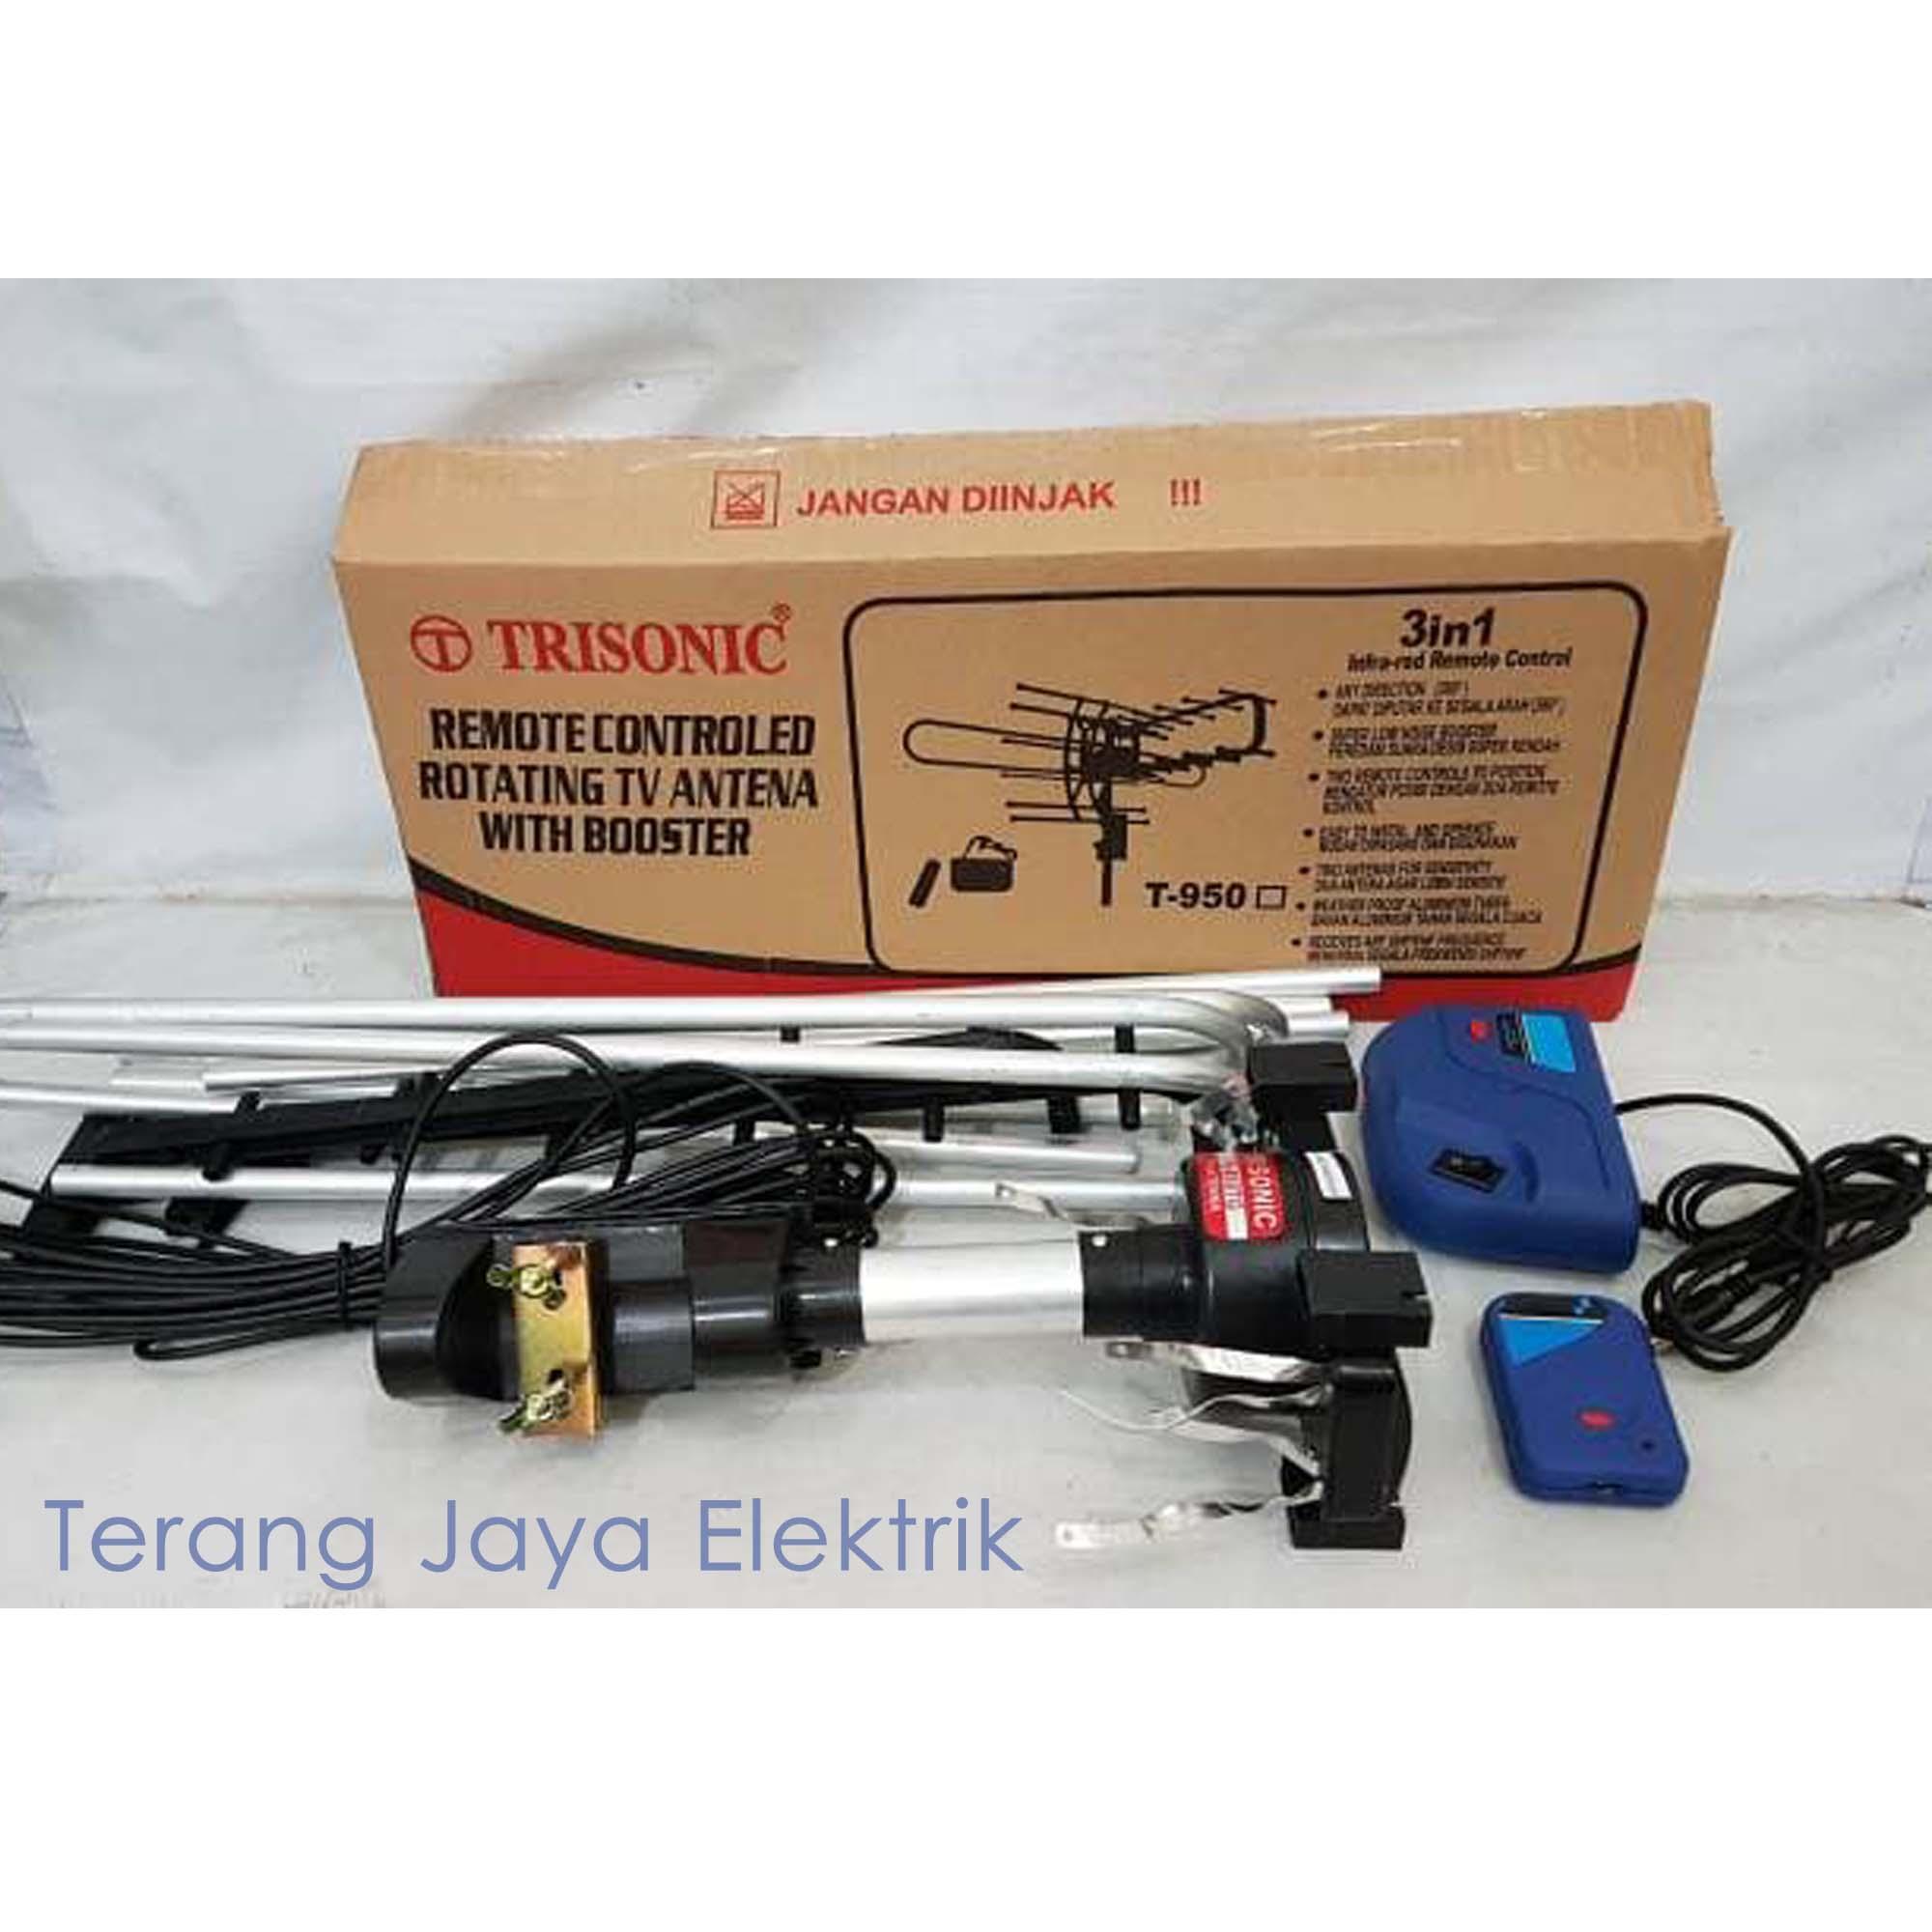 Kelebihan Antena Remote Remot Outdoor Luar Boster Booster 3 In 1 Toyosaki Tys 999 Penguat Signal Tv Trisonic